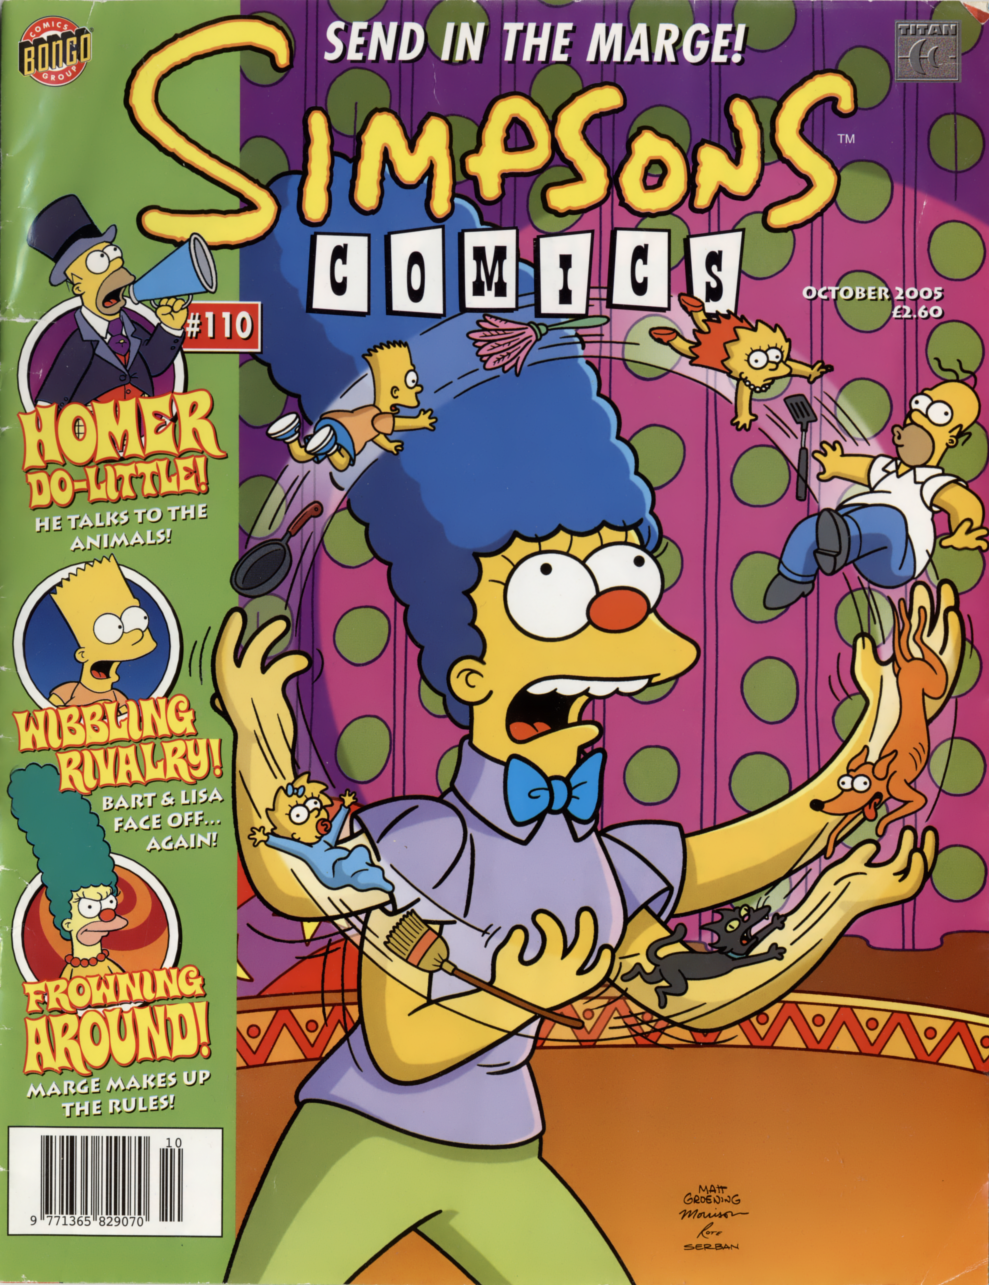 Simpsons Comics 110 (UK).png